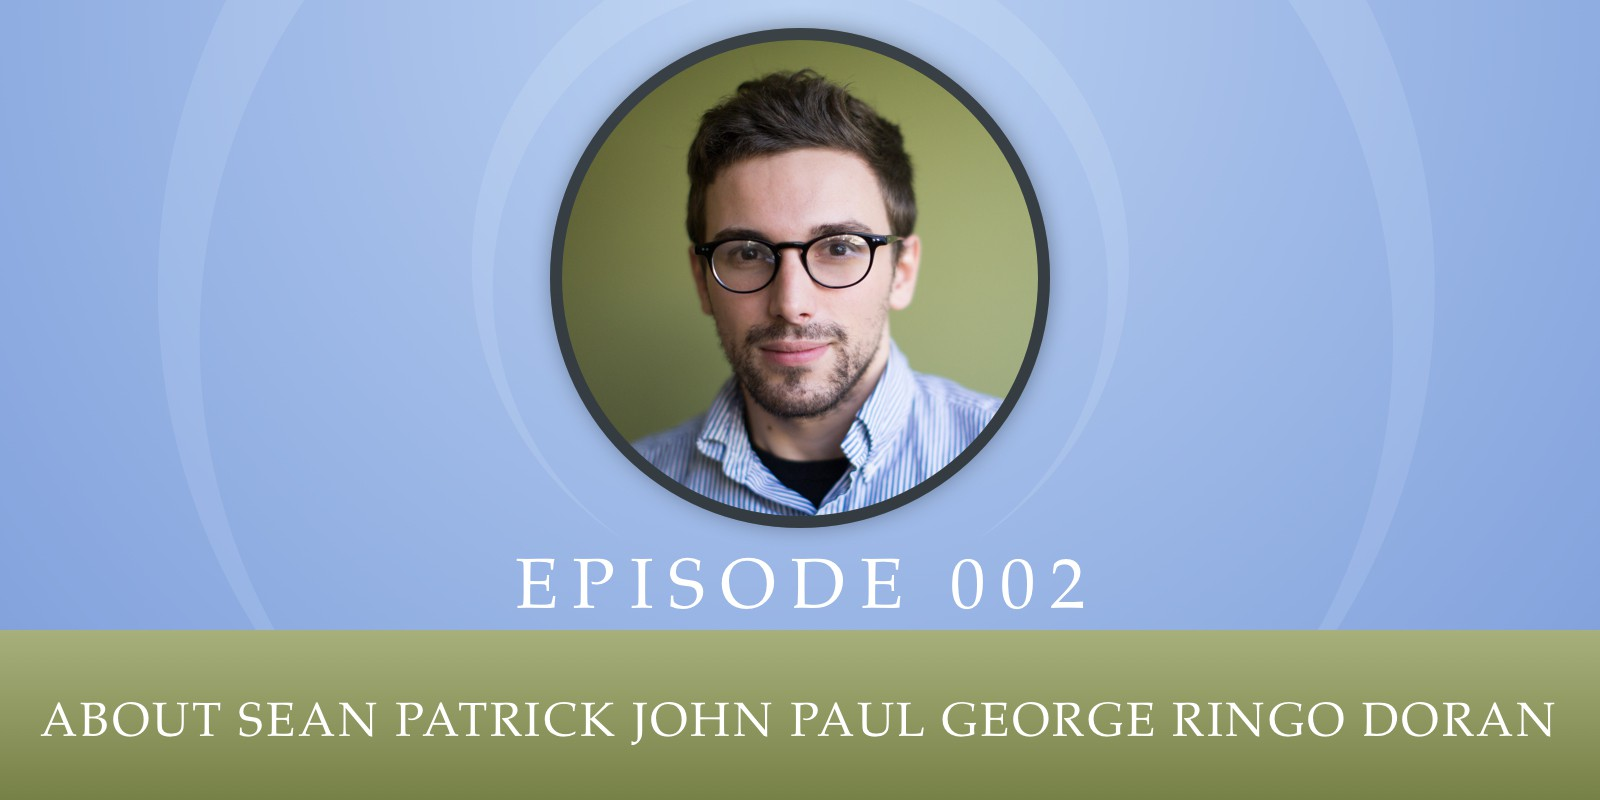 Episode 002: About Sean Patrick John Paul George Ringo Doran